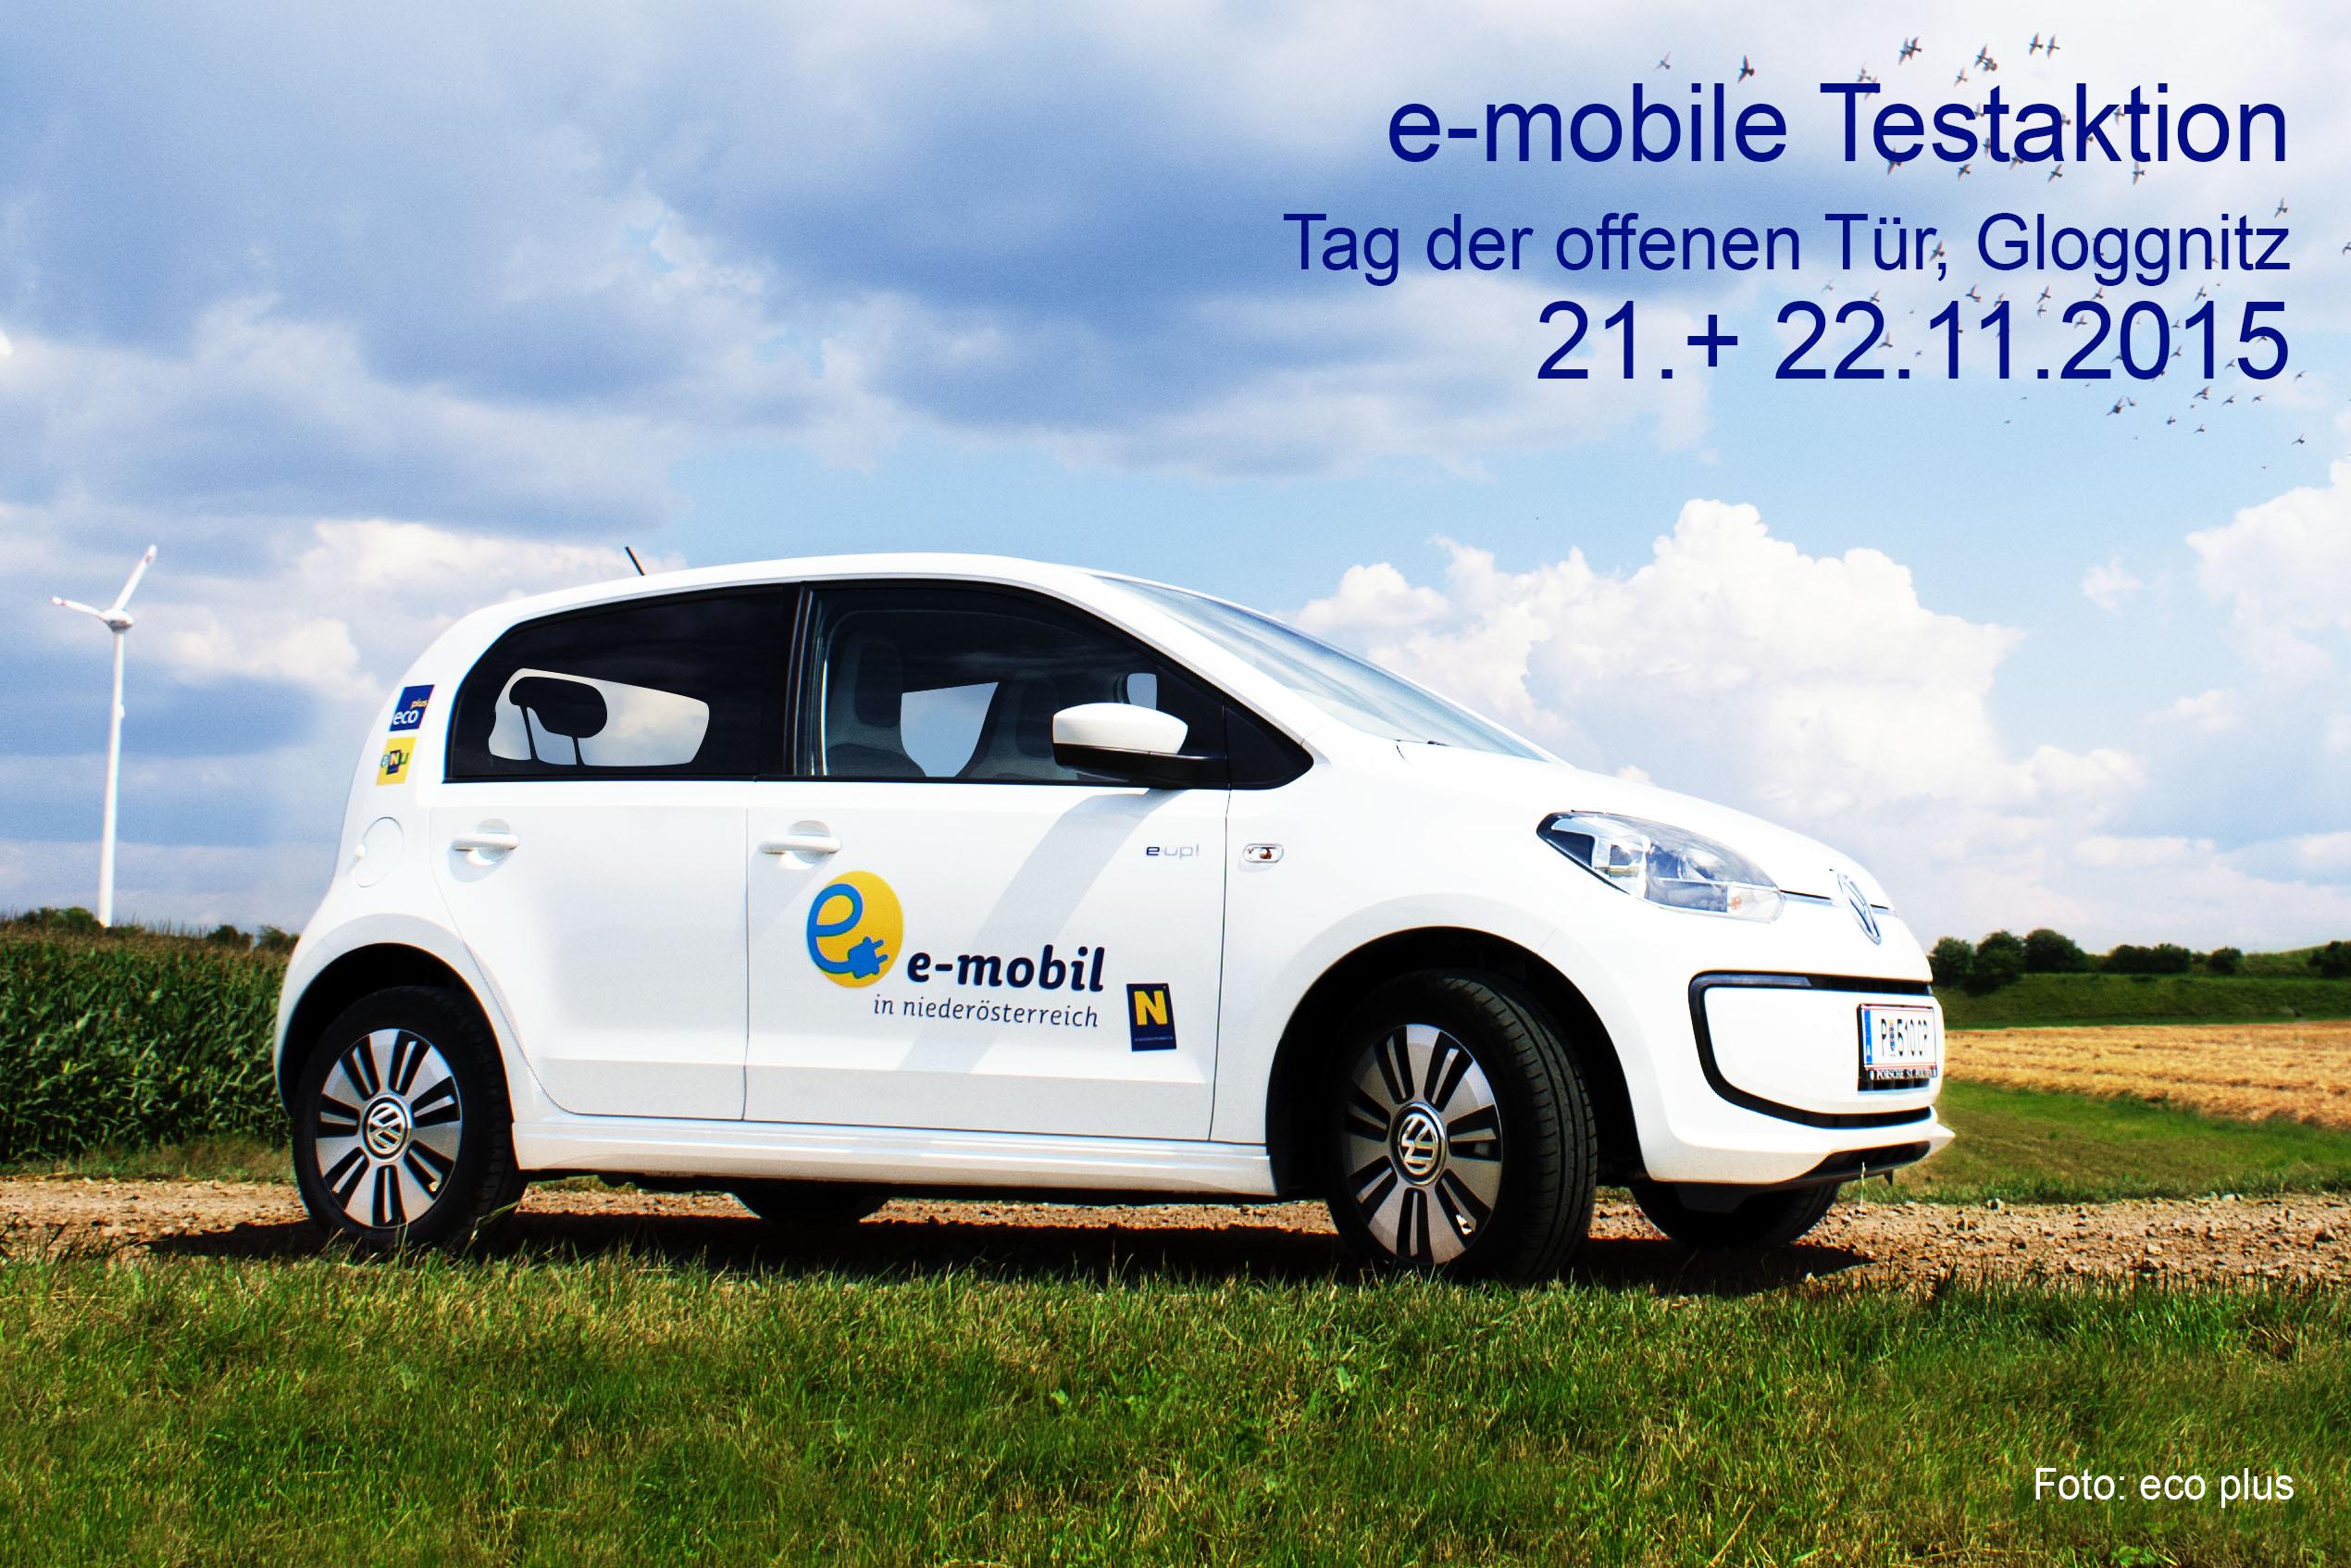 e-mobile Testaktion, Gloggnitz